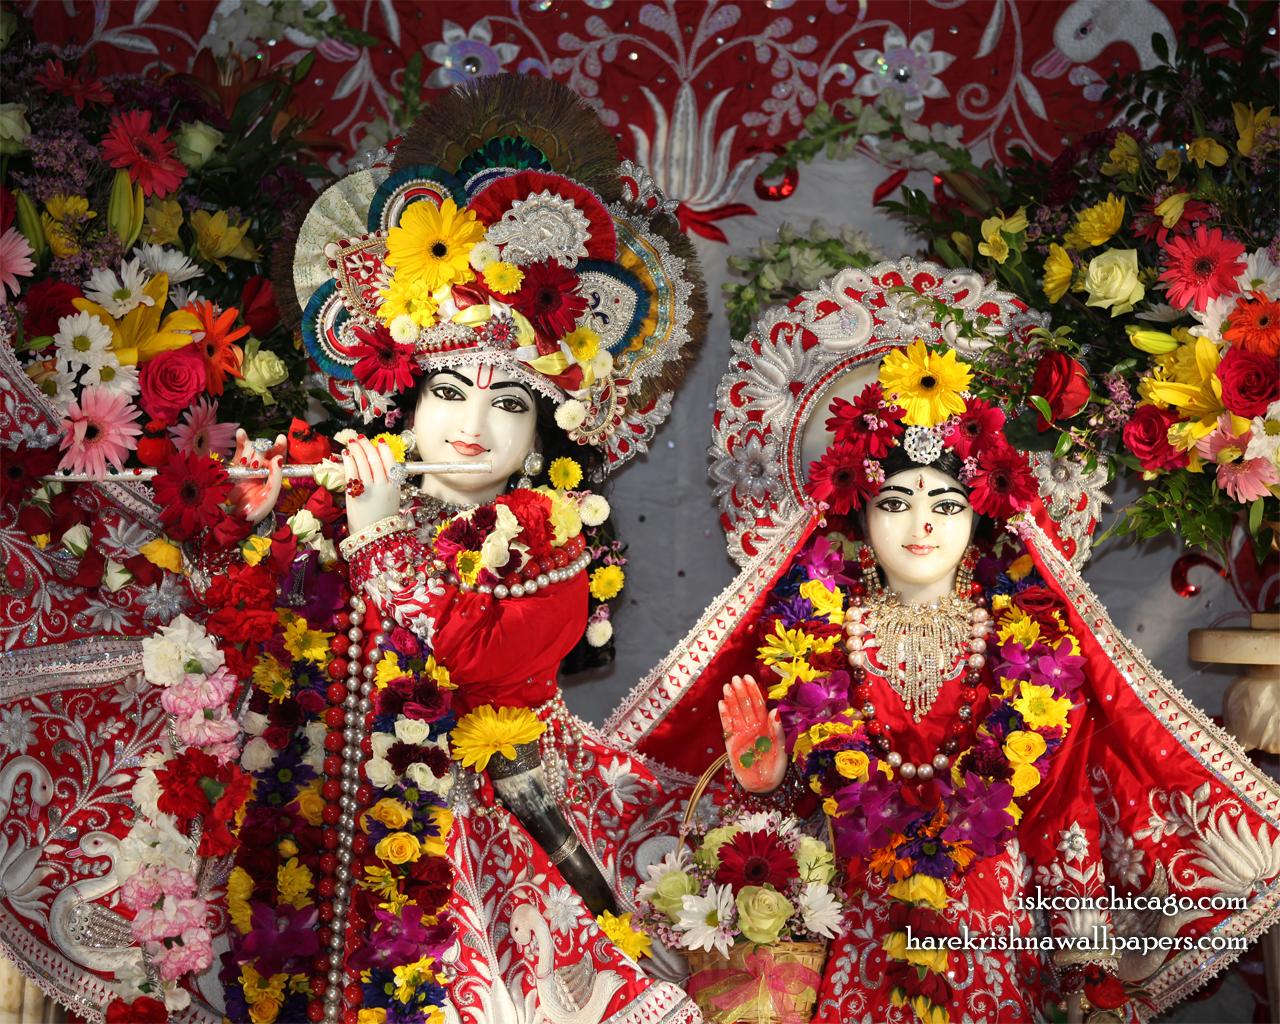 Sri Sri Kishore Kishori Close up Wallpaper (008) Size 1280x1024 Download